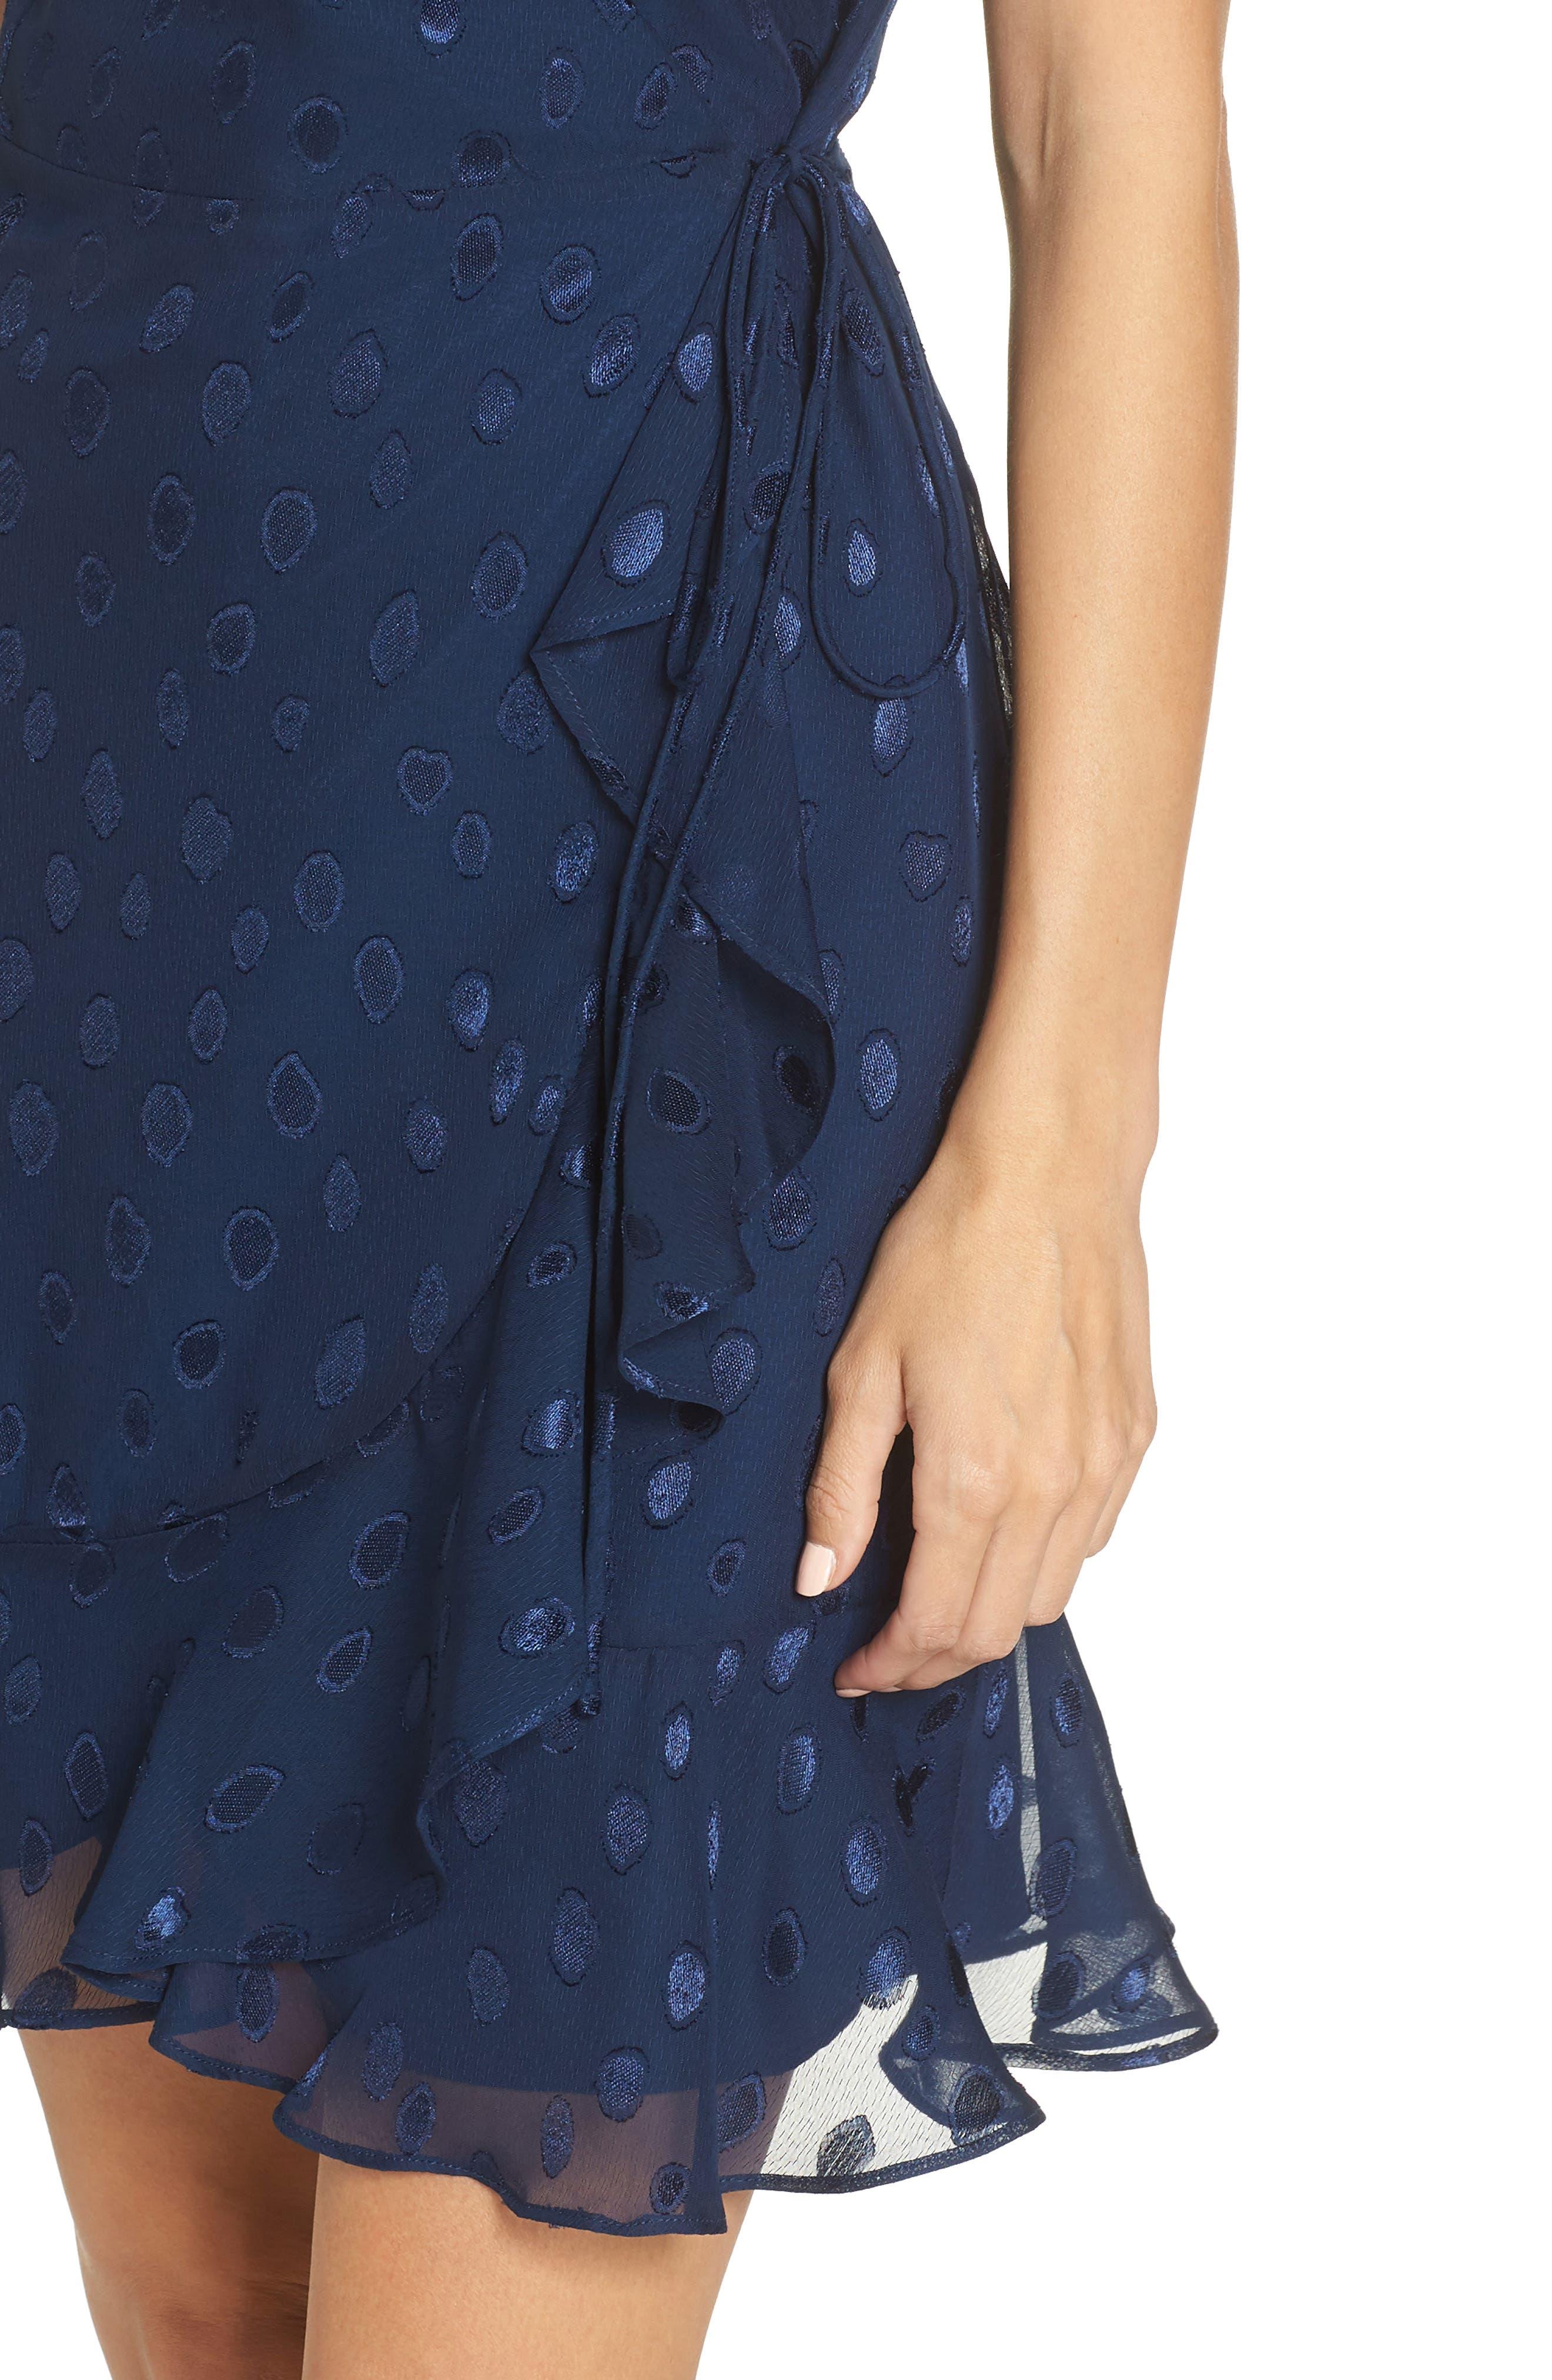 CHARLES HENRY, Wrap Chiffon Jacquard Minidress, Alternate thumbnail 5, color, 400